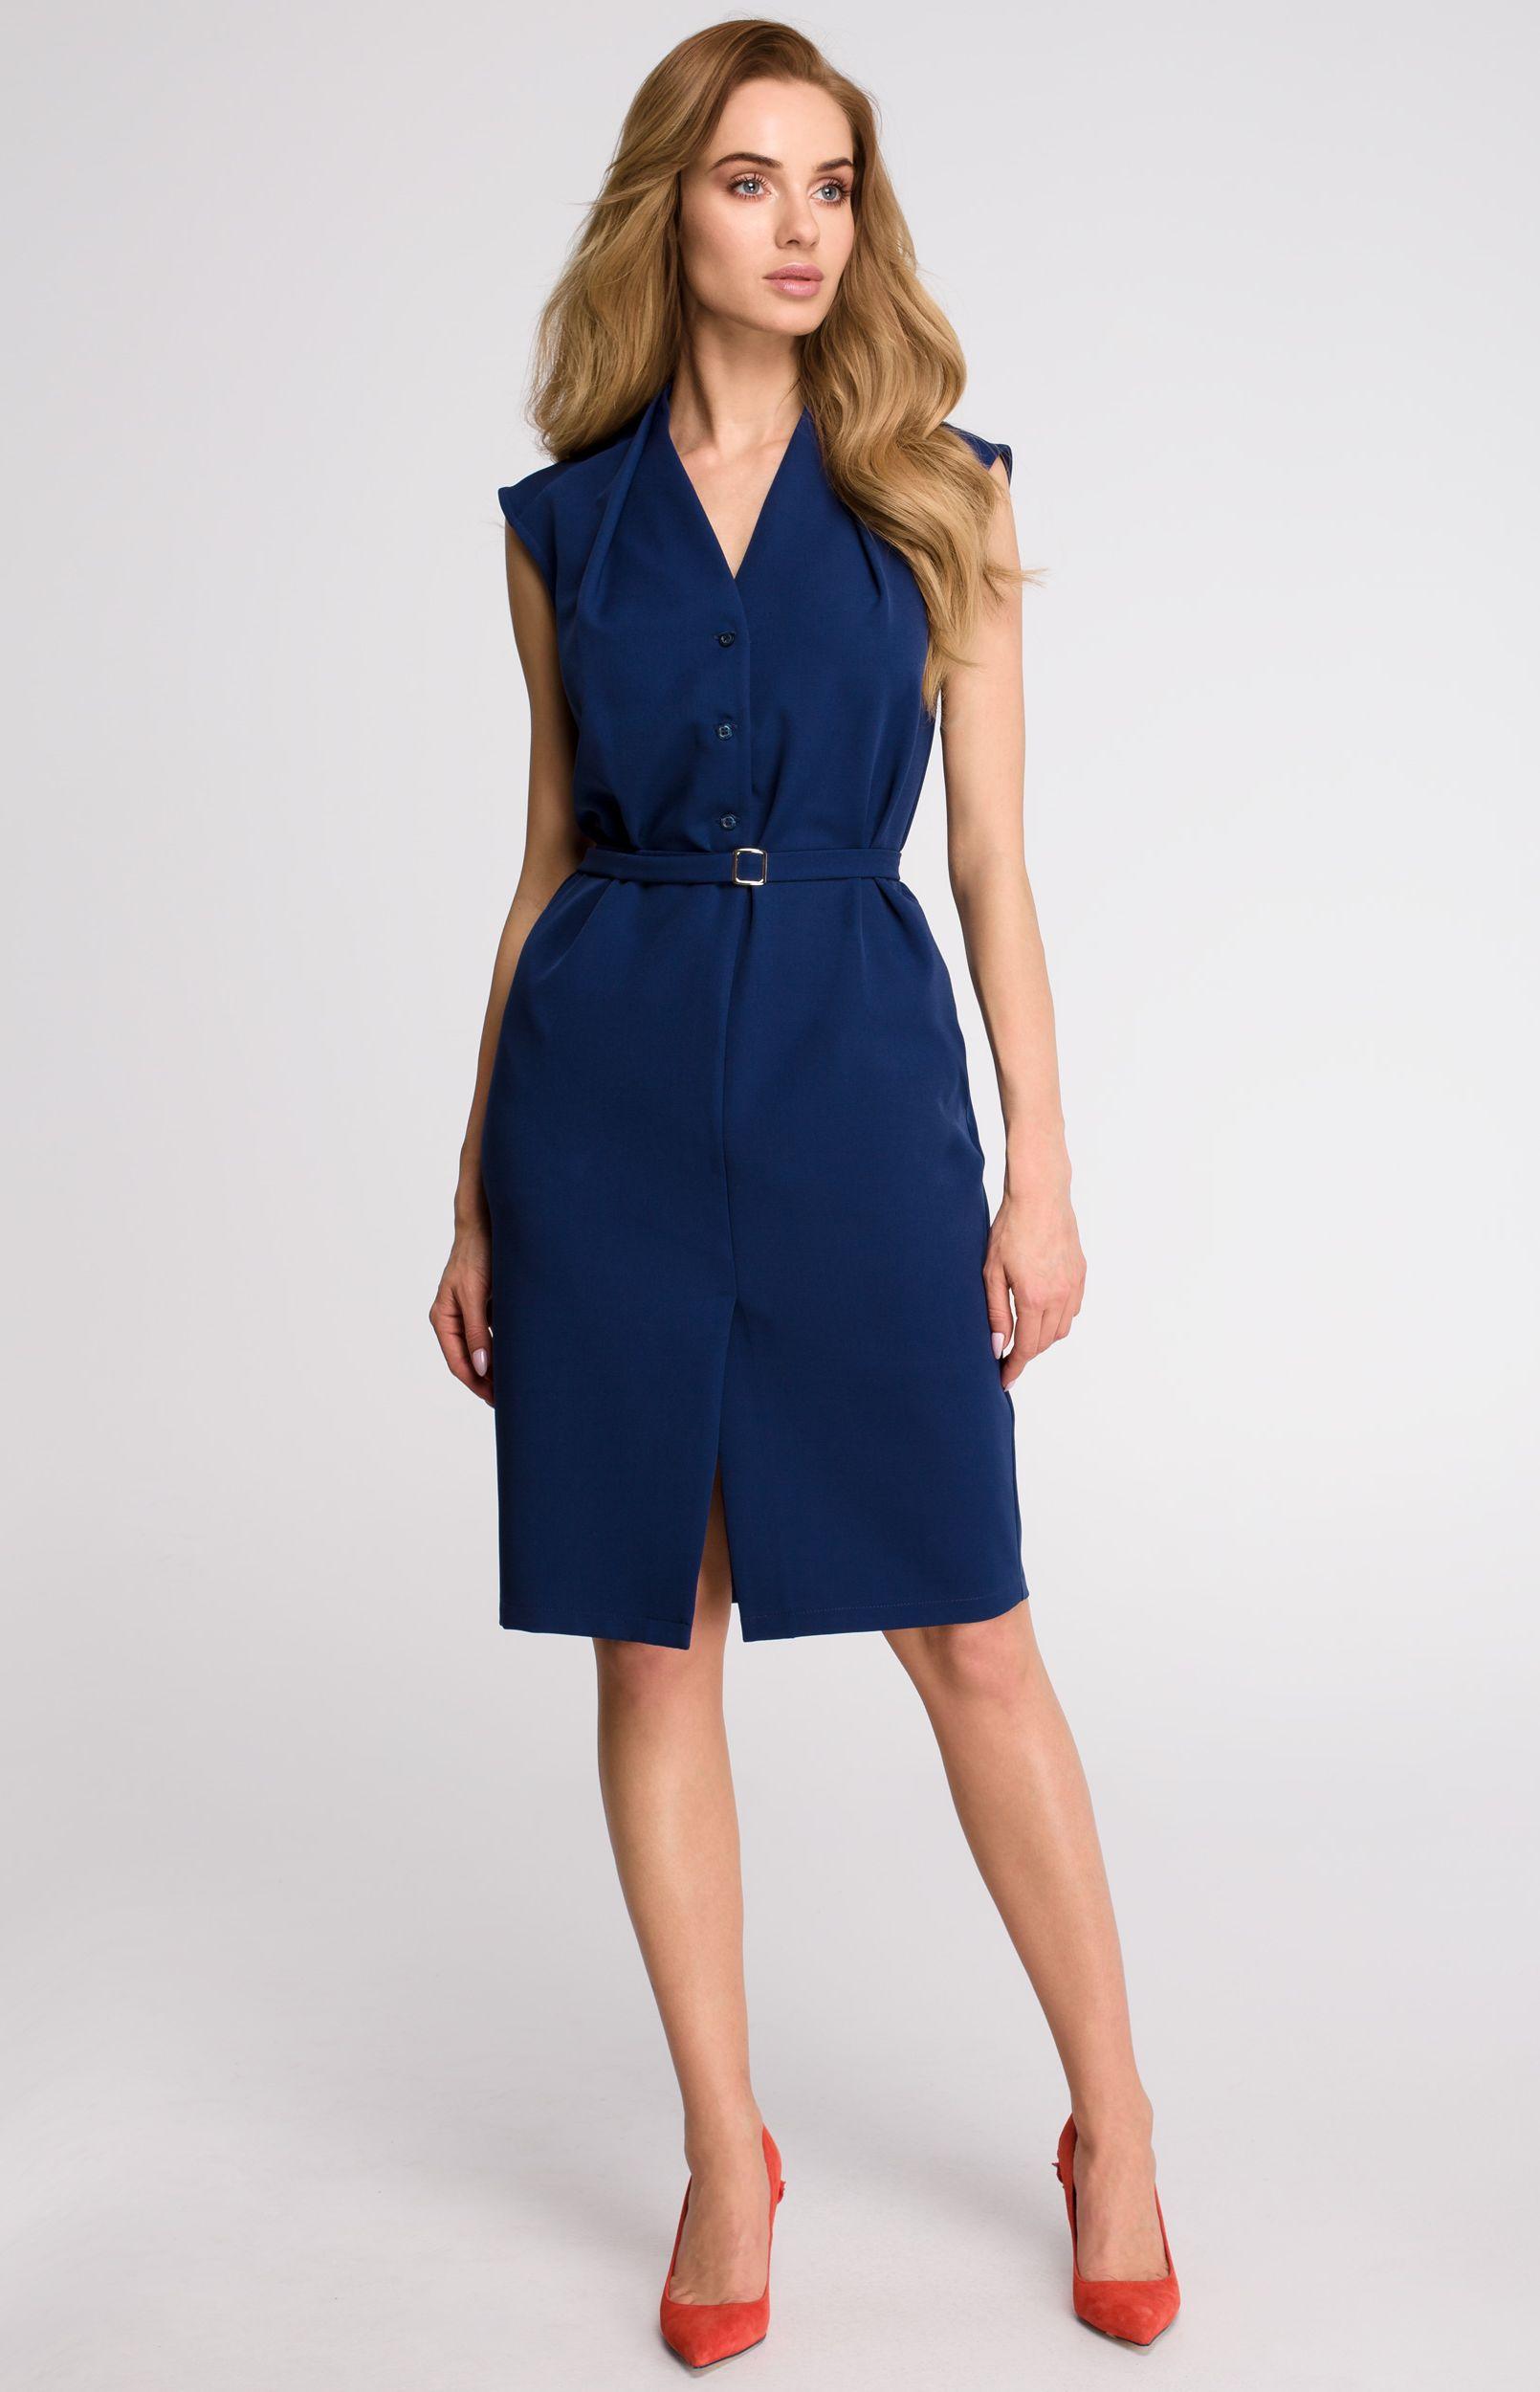 Robe chemise sans manches bleu marine Style S102BM   idresstocode ... 57974b0f9118